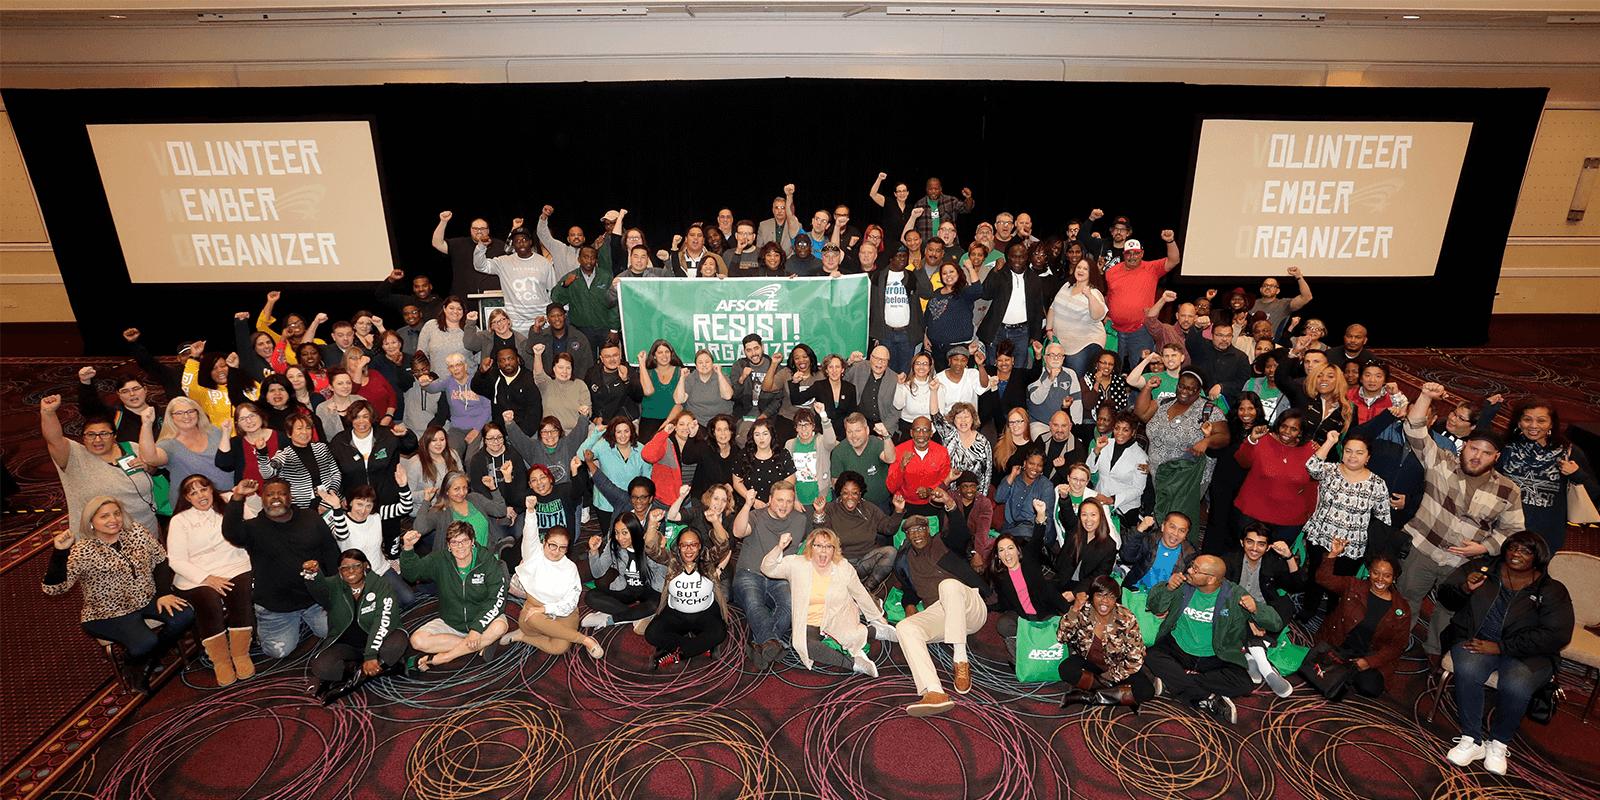 Group photo of AFSCME volunteer member organizers